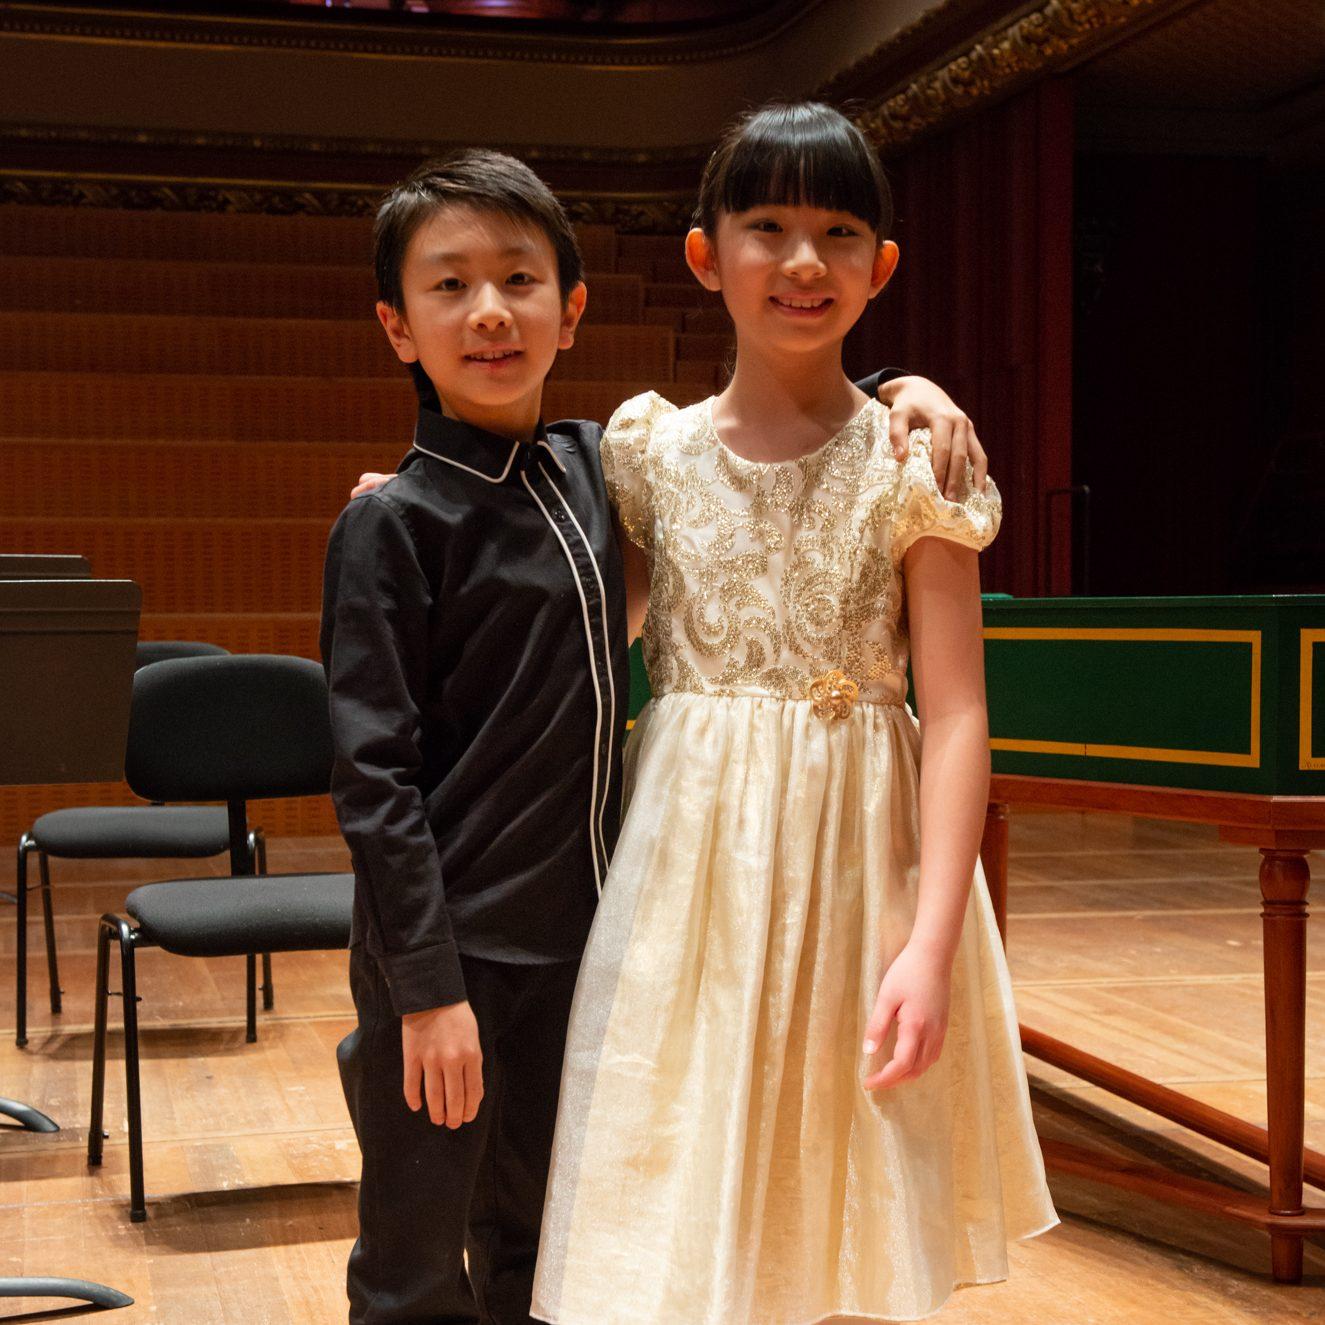 Christian Li and Chloe Chua